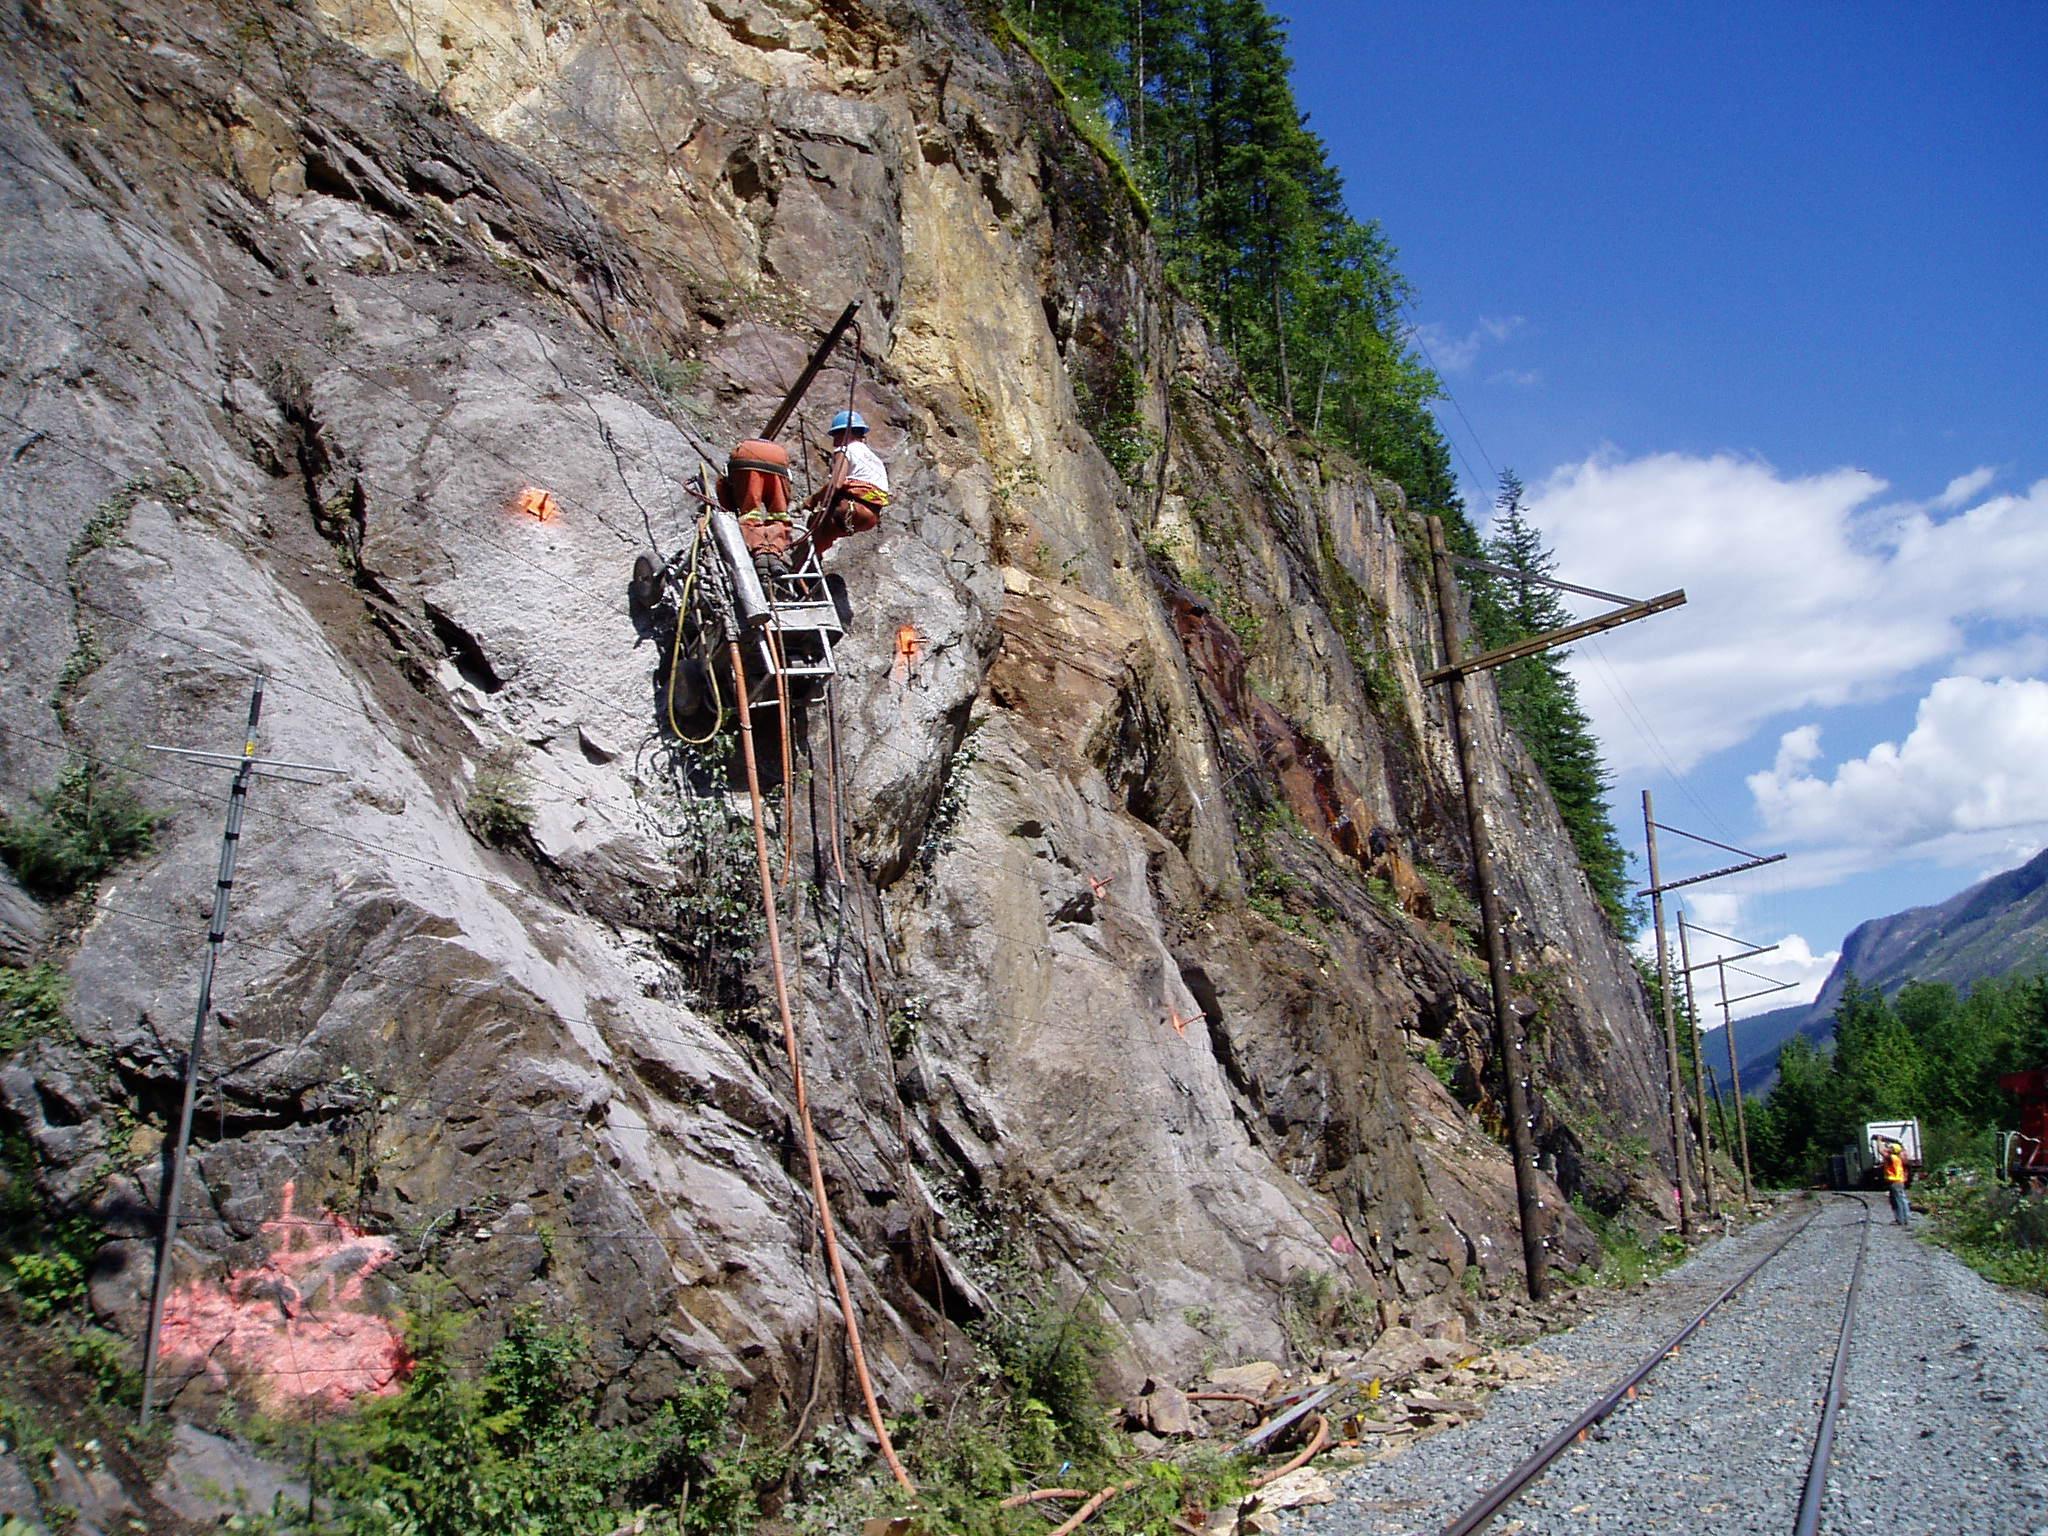 Belcourt Saxon Coal Project, Tumbler Ridge, British Columbia